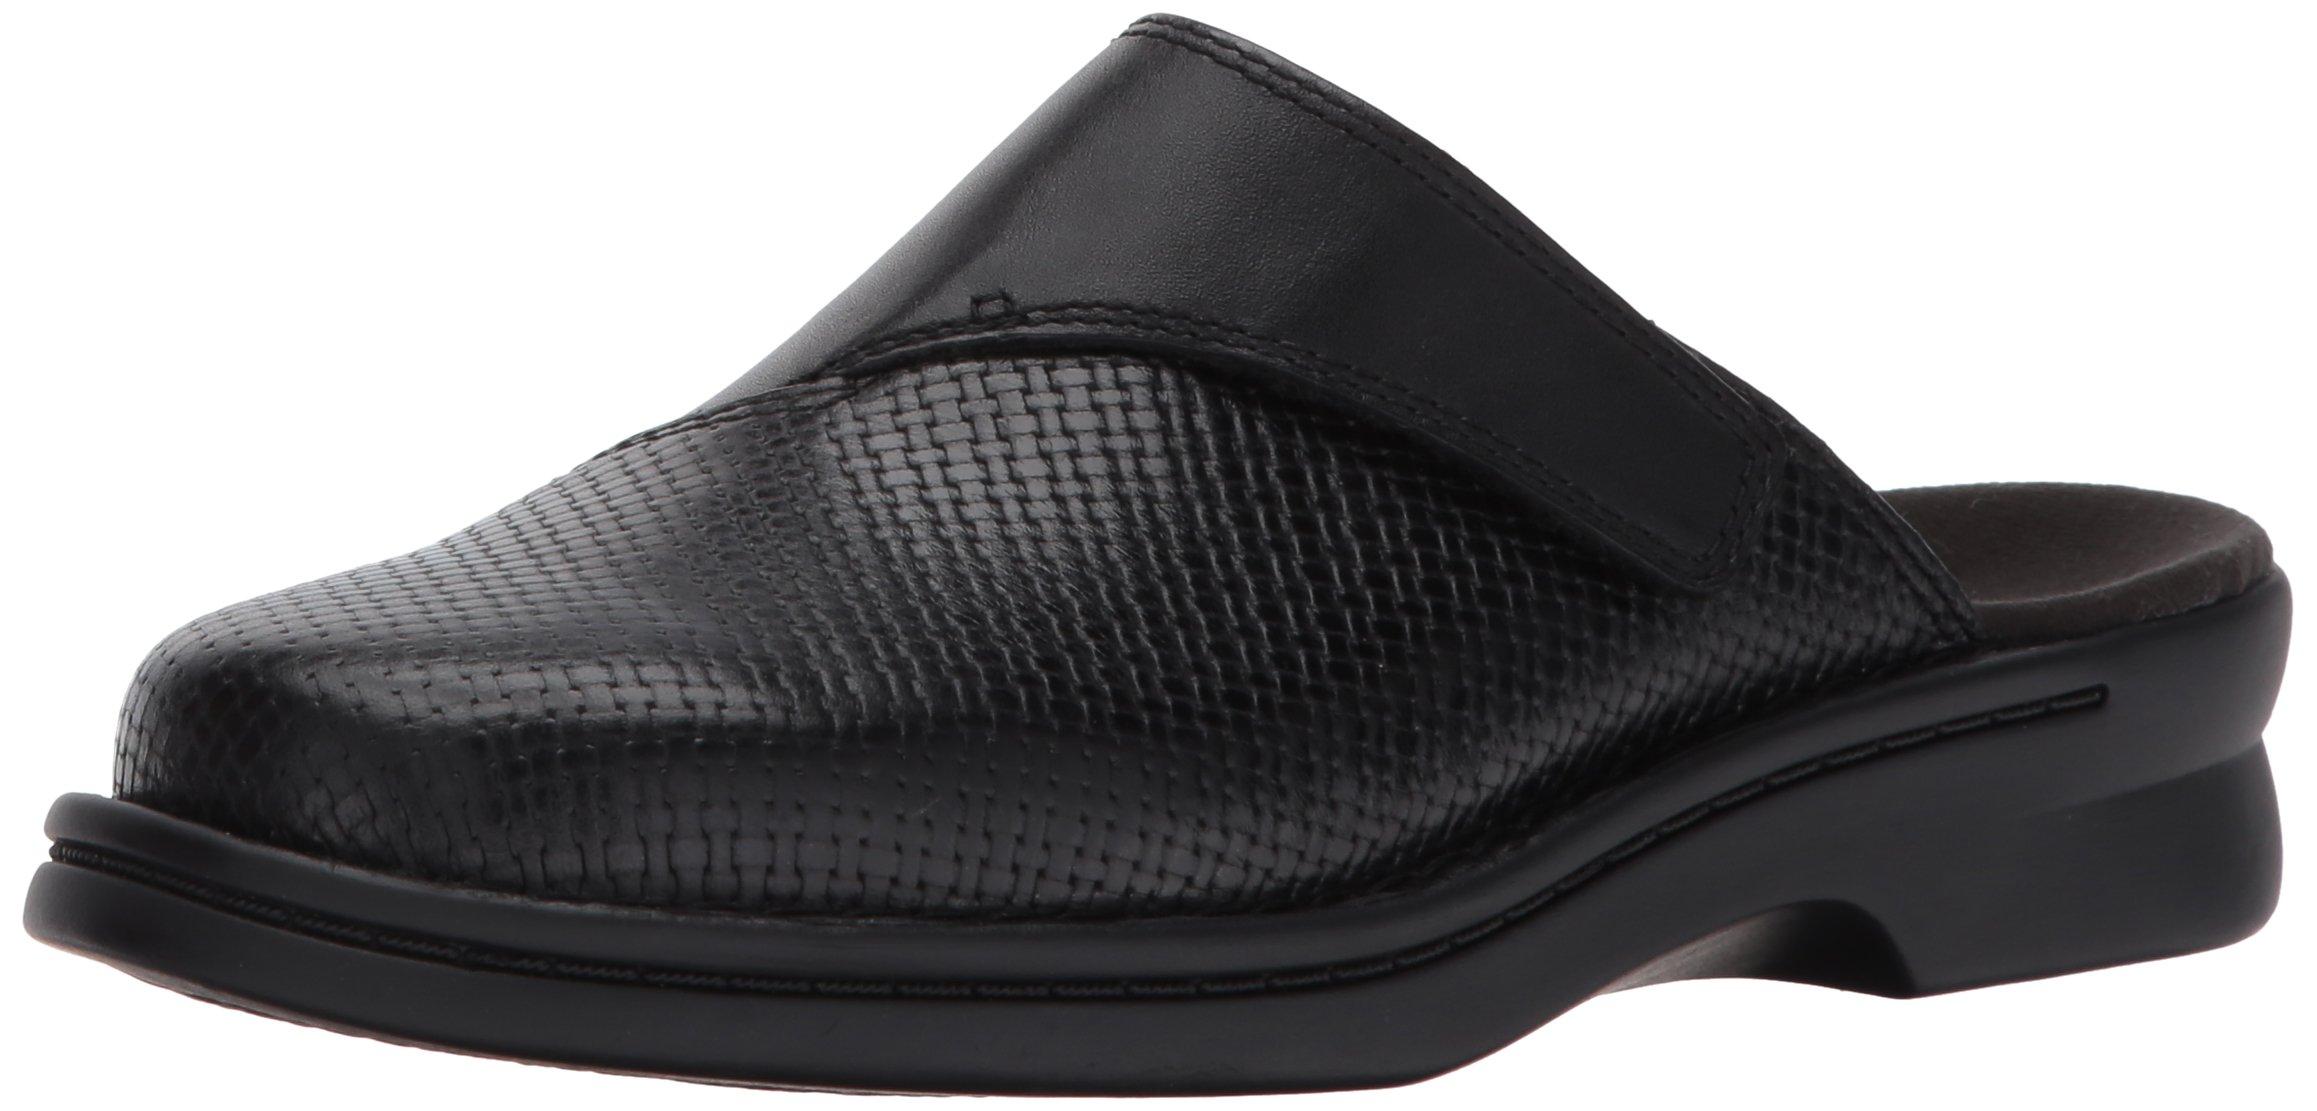 CLARK'S Women's Patty Tayna Mule, Black Leather, 8.5 W US